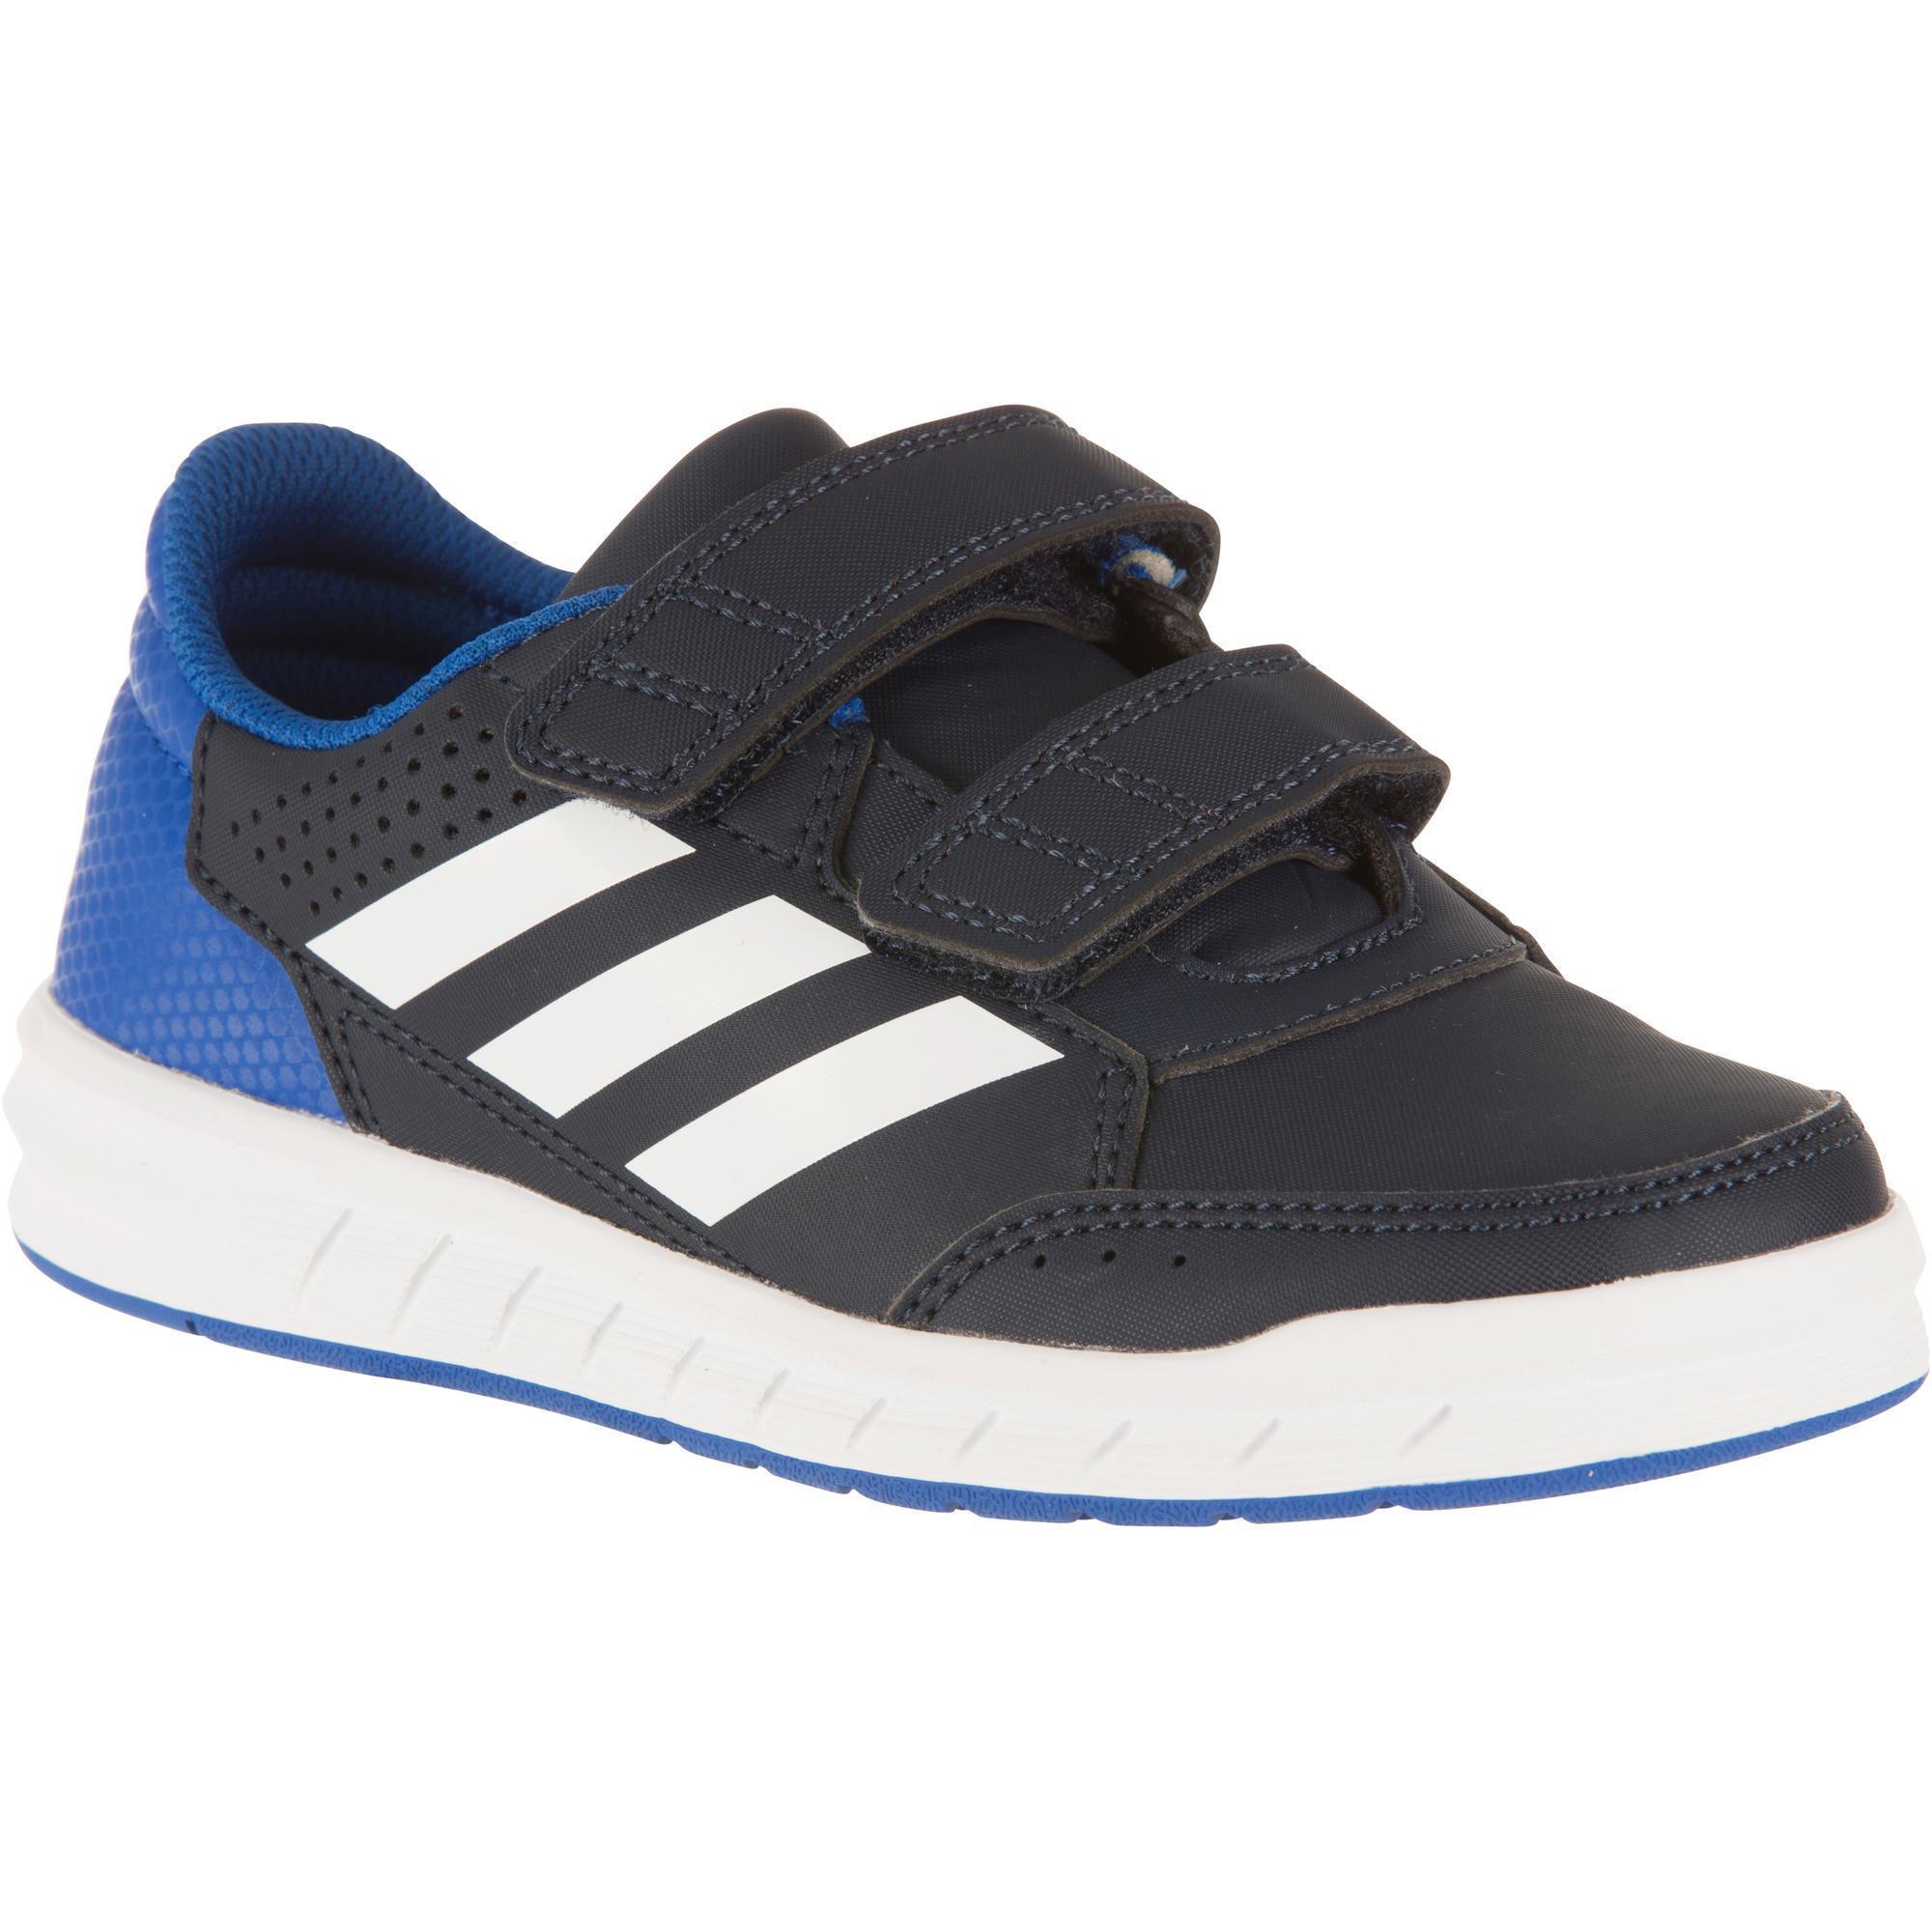 Adidas Tennisschoenen kinderen Adidas Altasport blauw